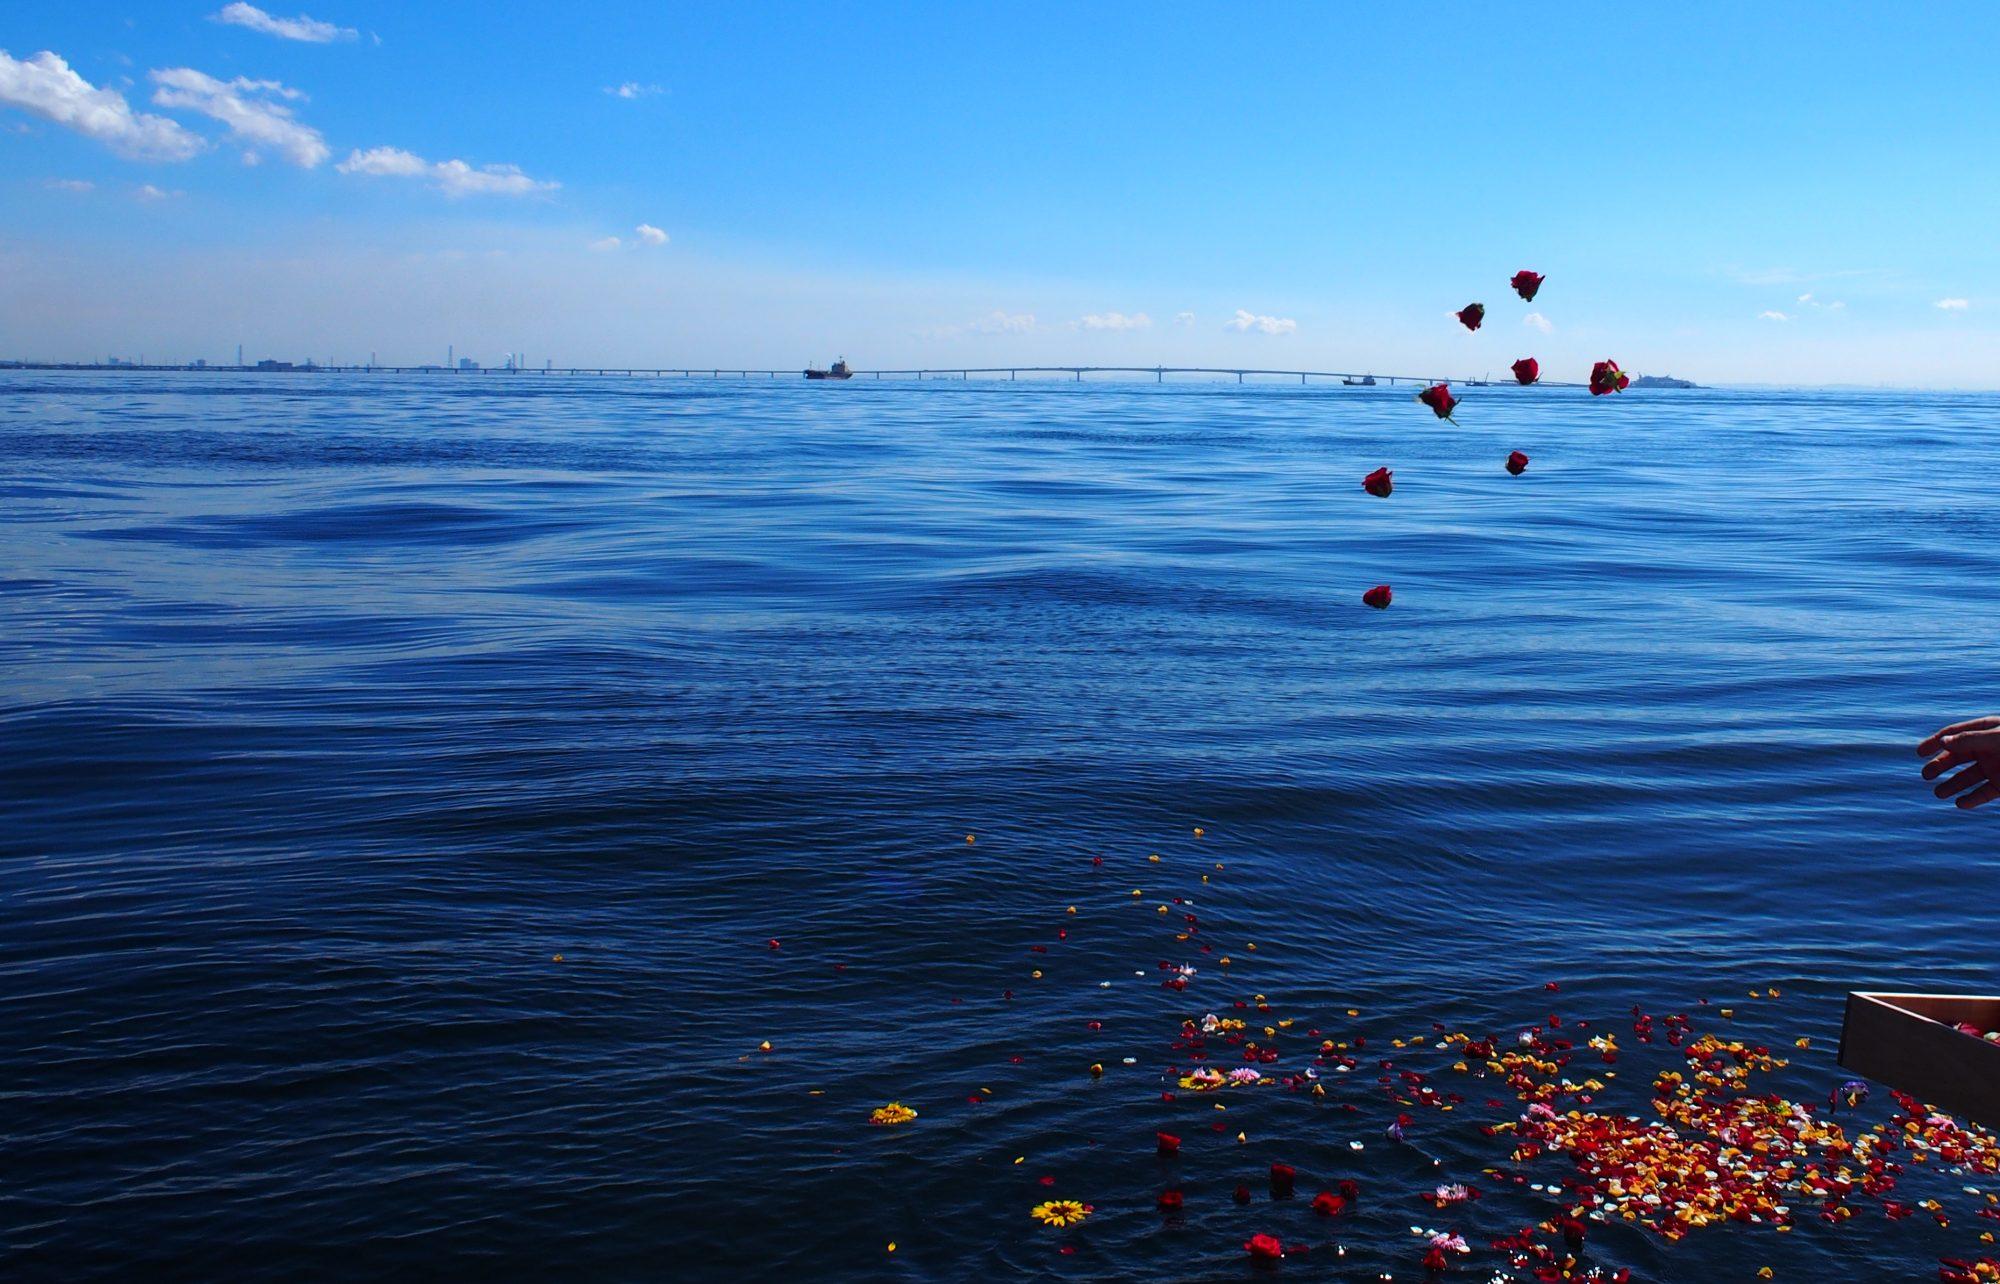 東京海洋散骨ブログ